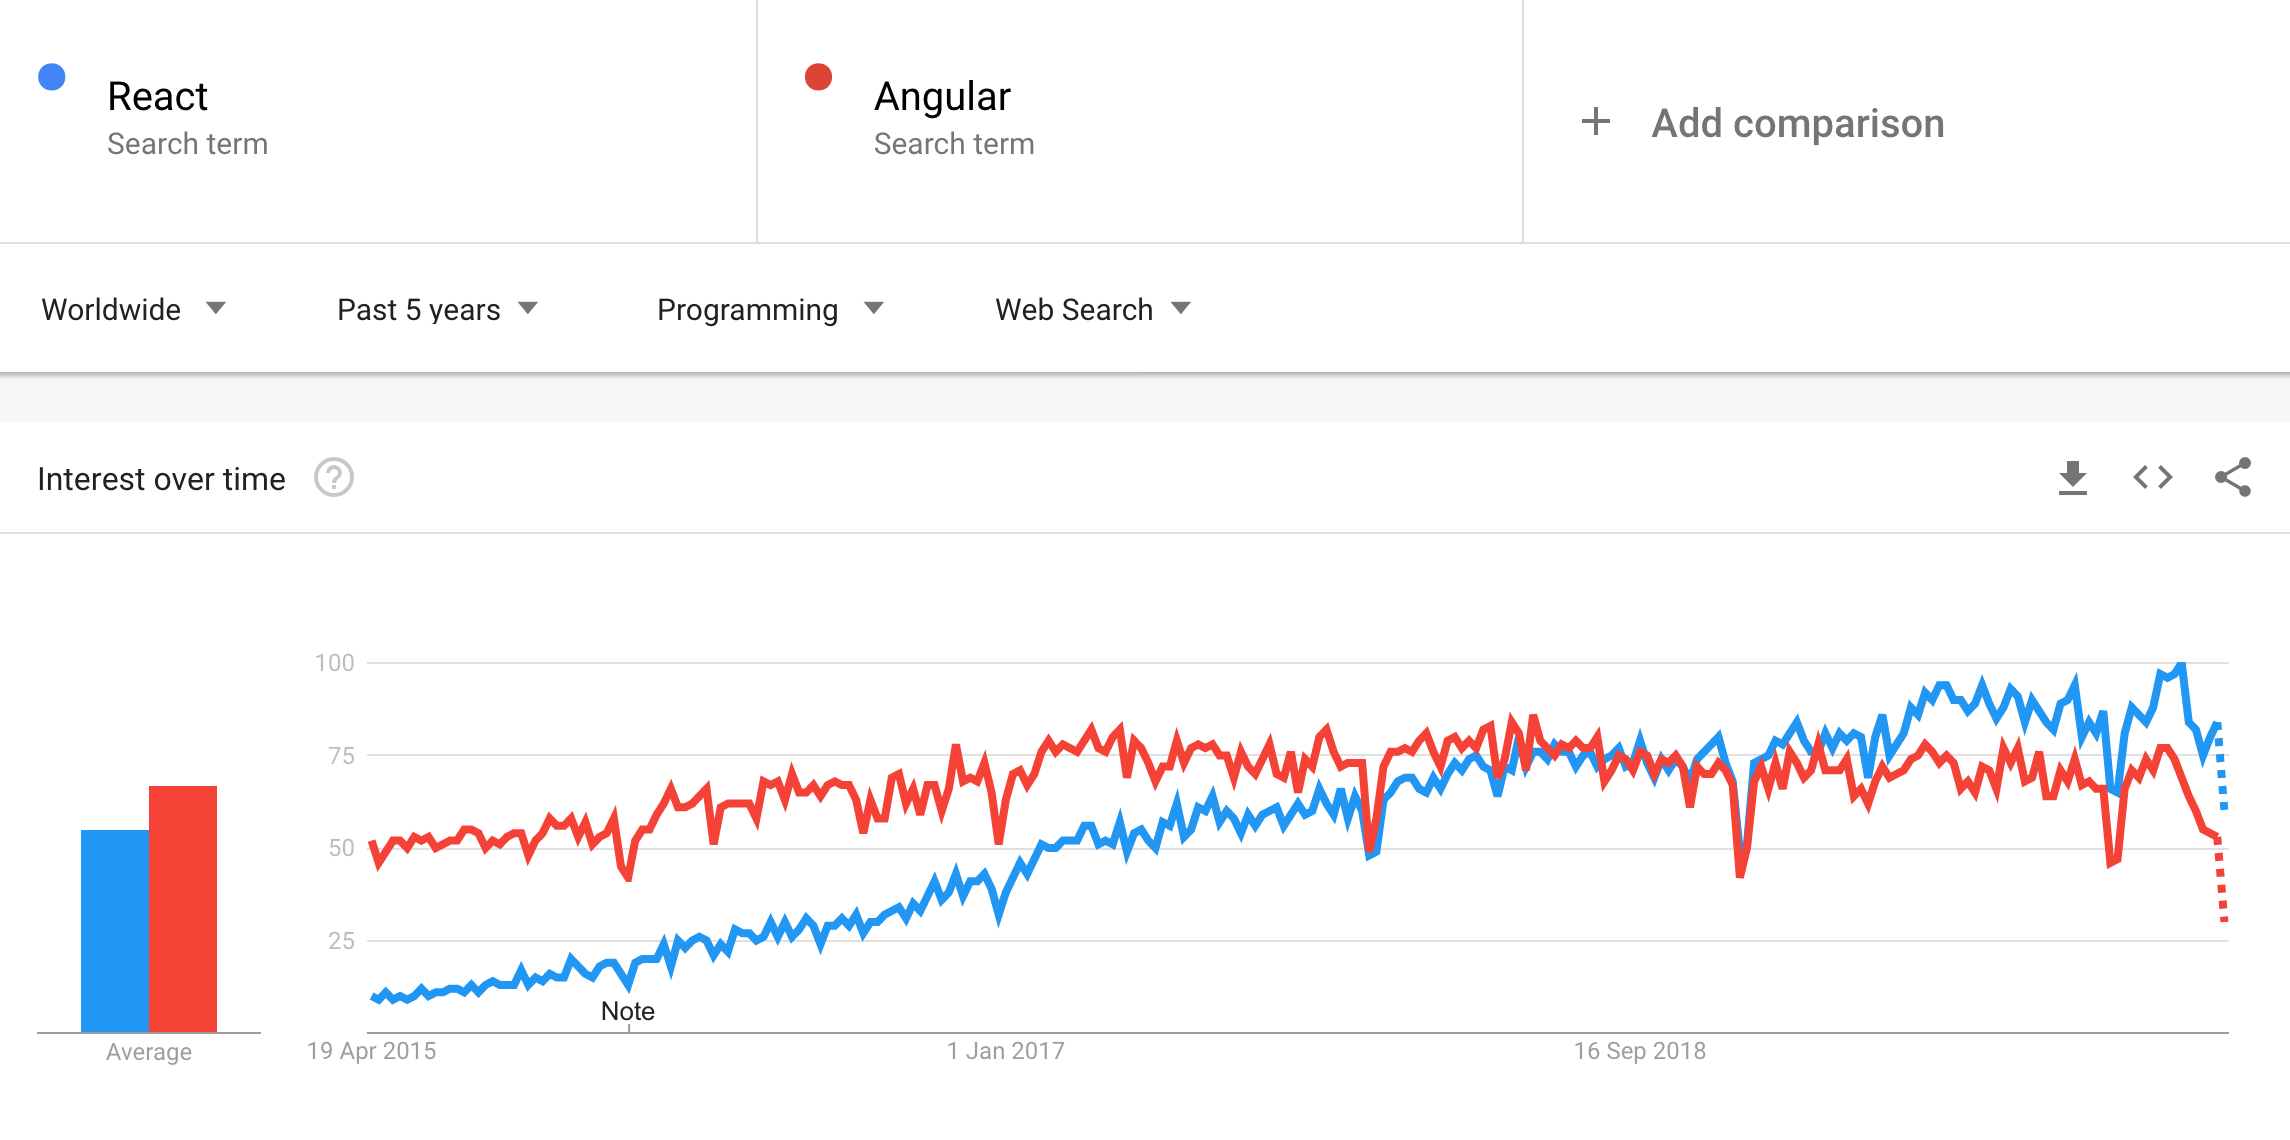 Google Trends: Angular vs React